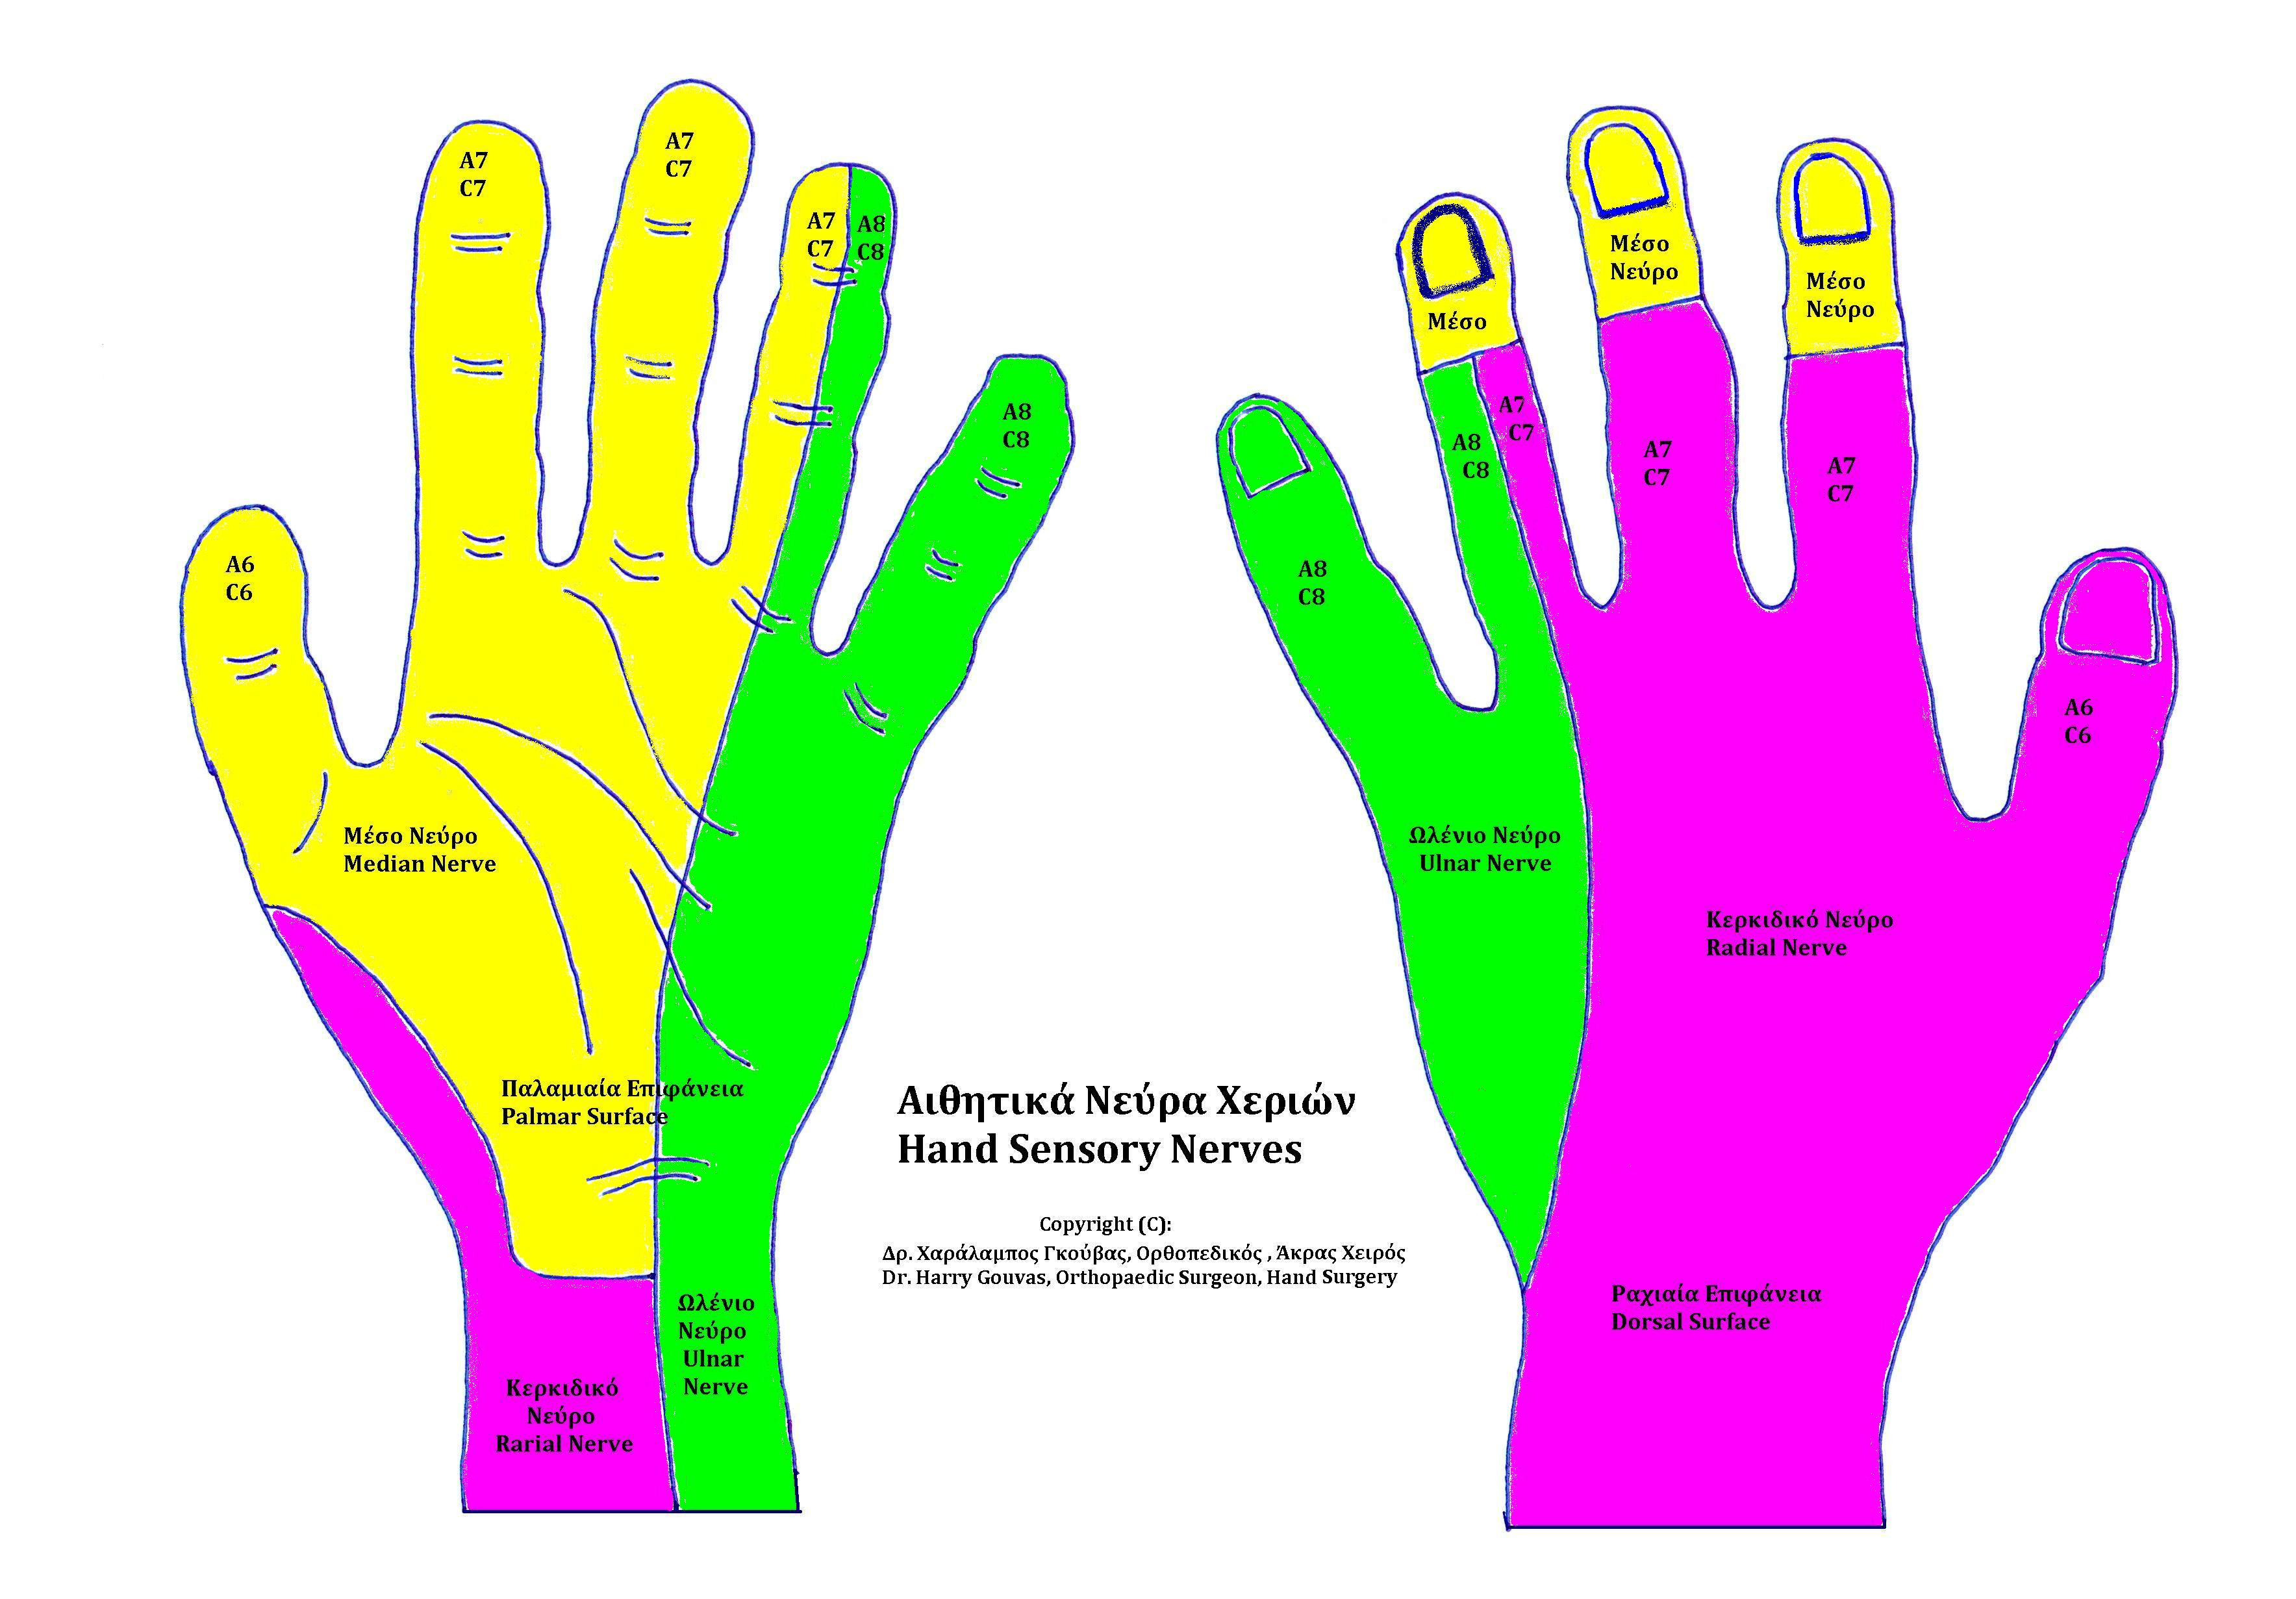 Hand Sensory Nerves